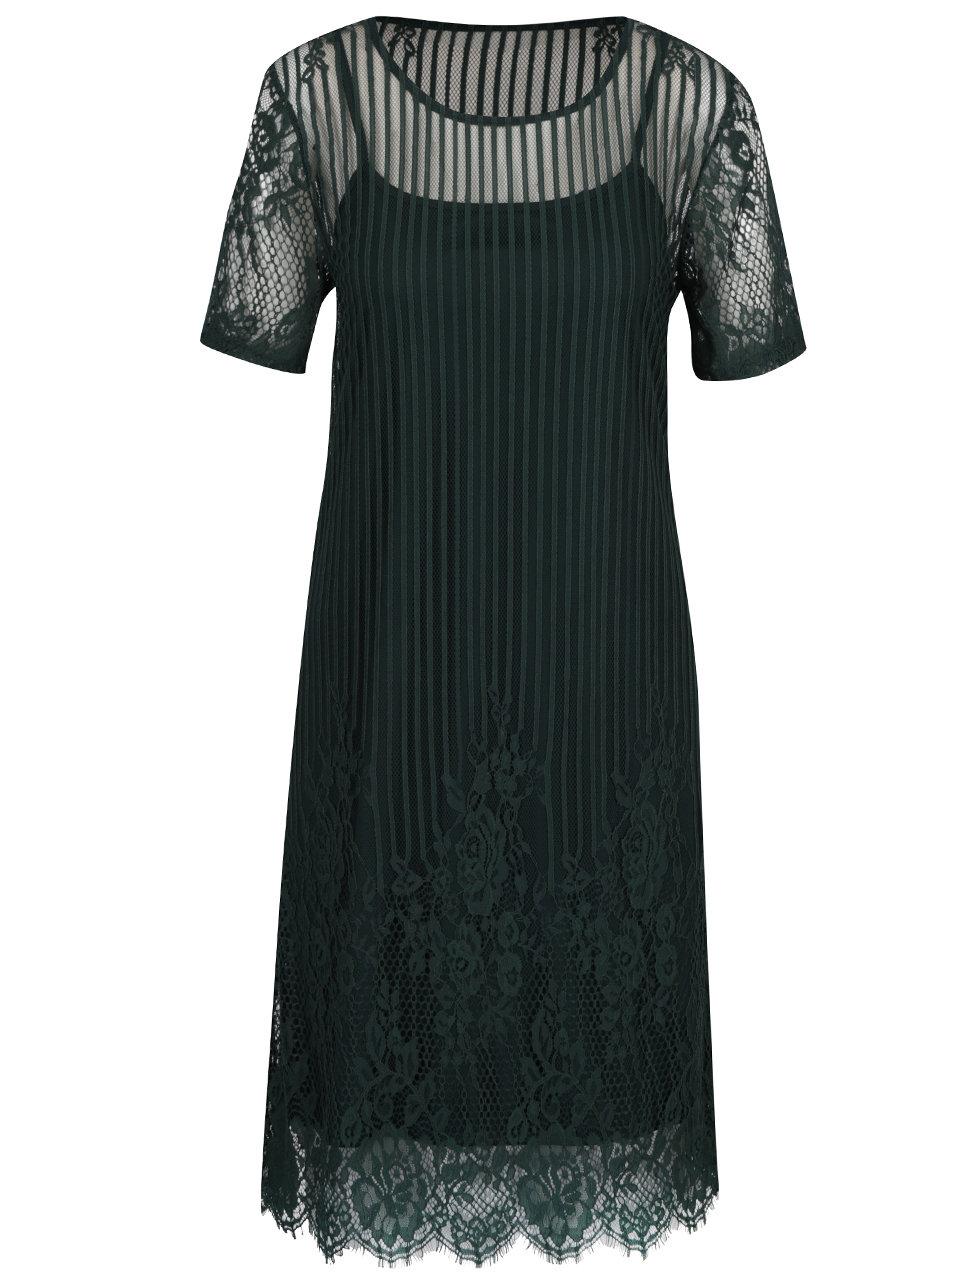 Tmavozelené čipkované šaty 2v1 VILA Maggy ... bb95e794b8d